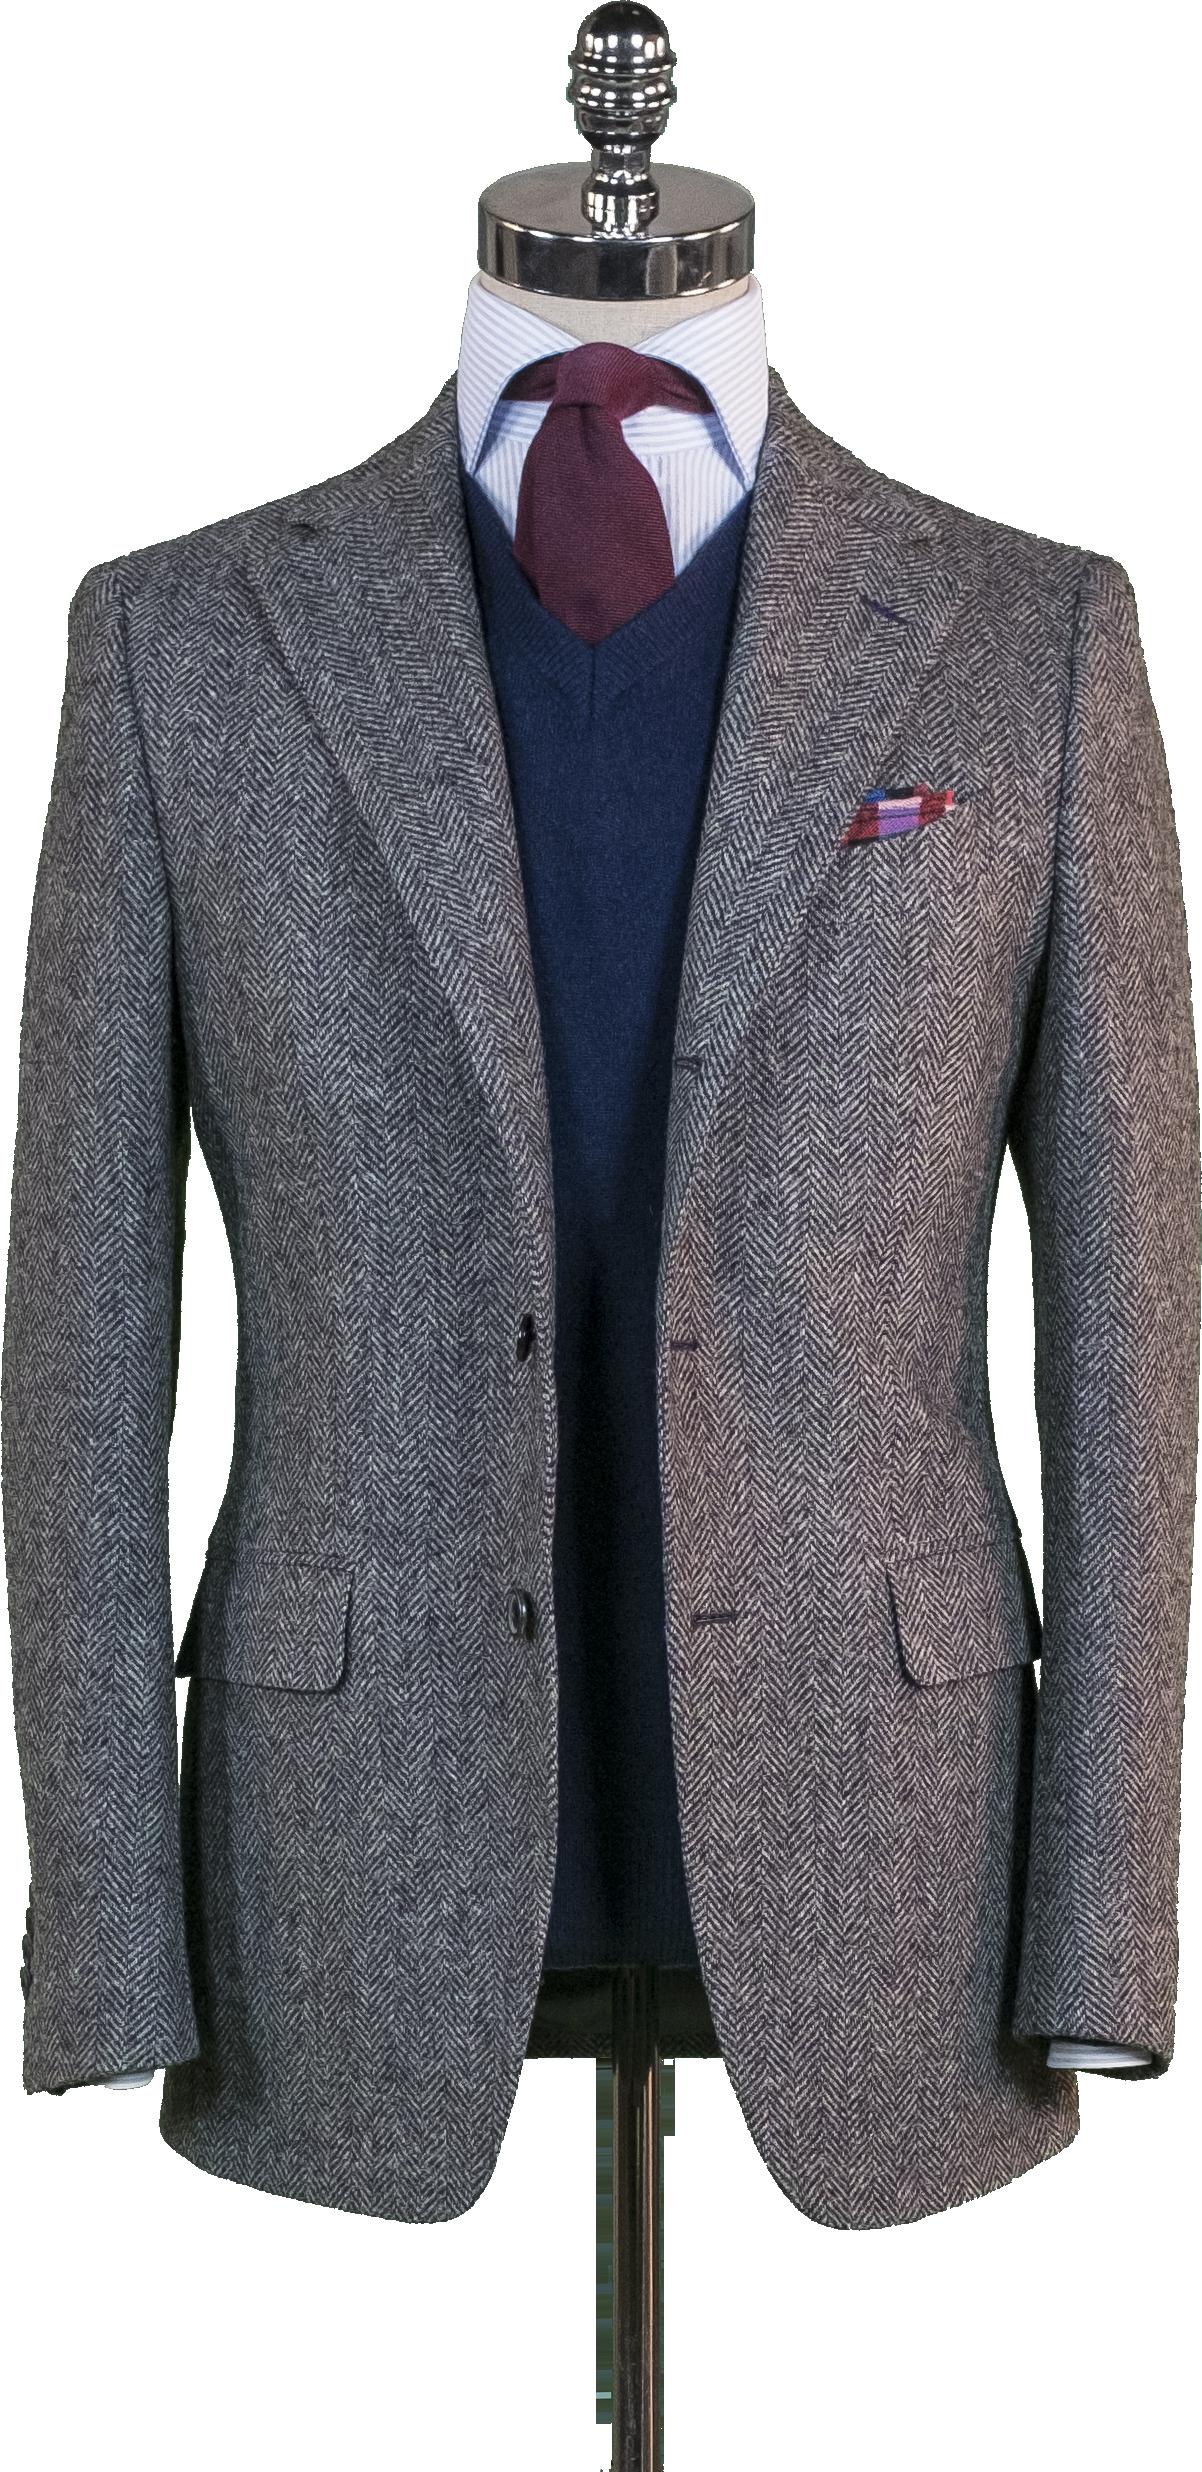 b791133d0ec Grey Herringbone Tweed Sport Coat - Beckett   Robb